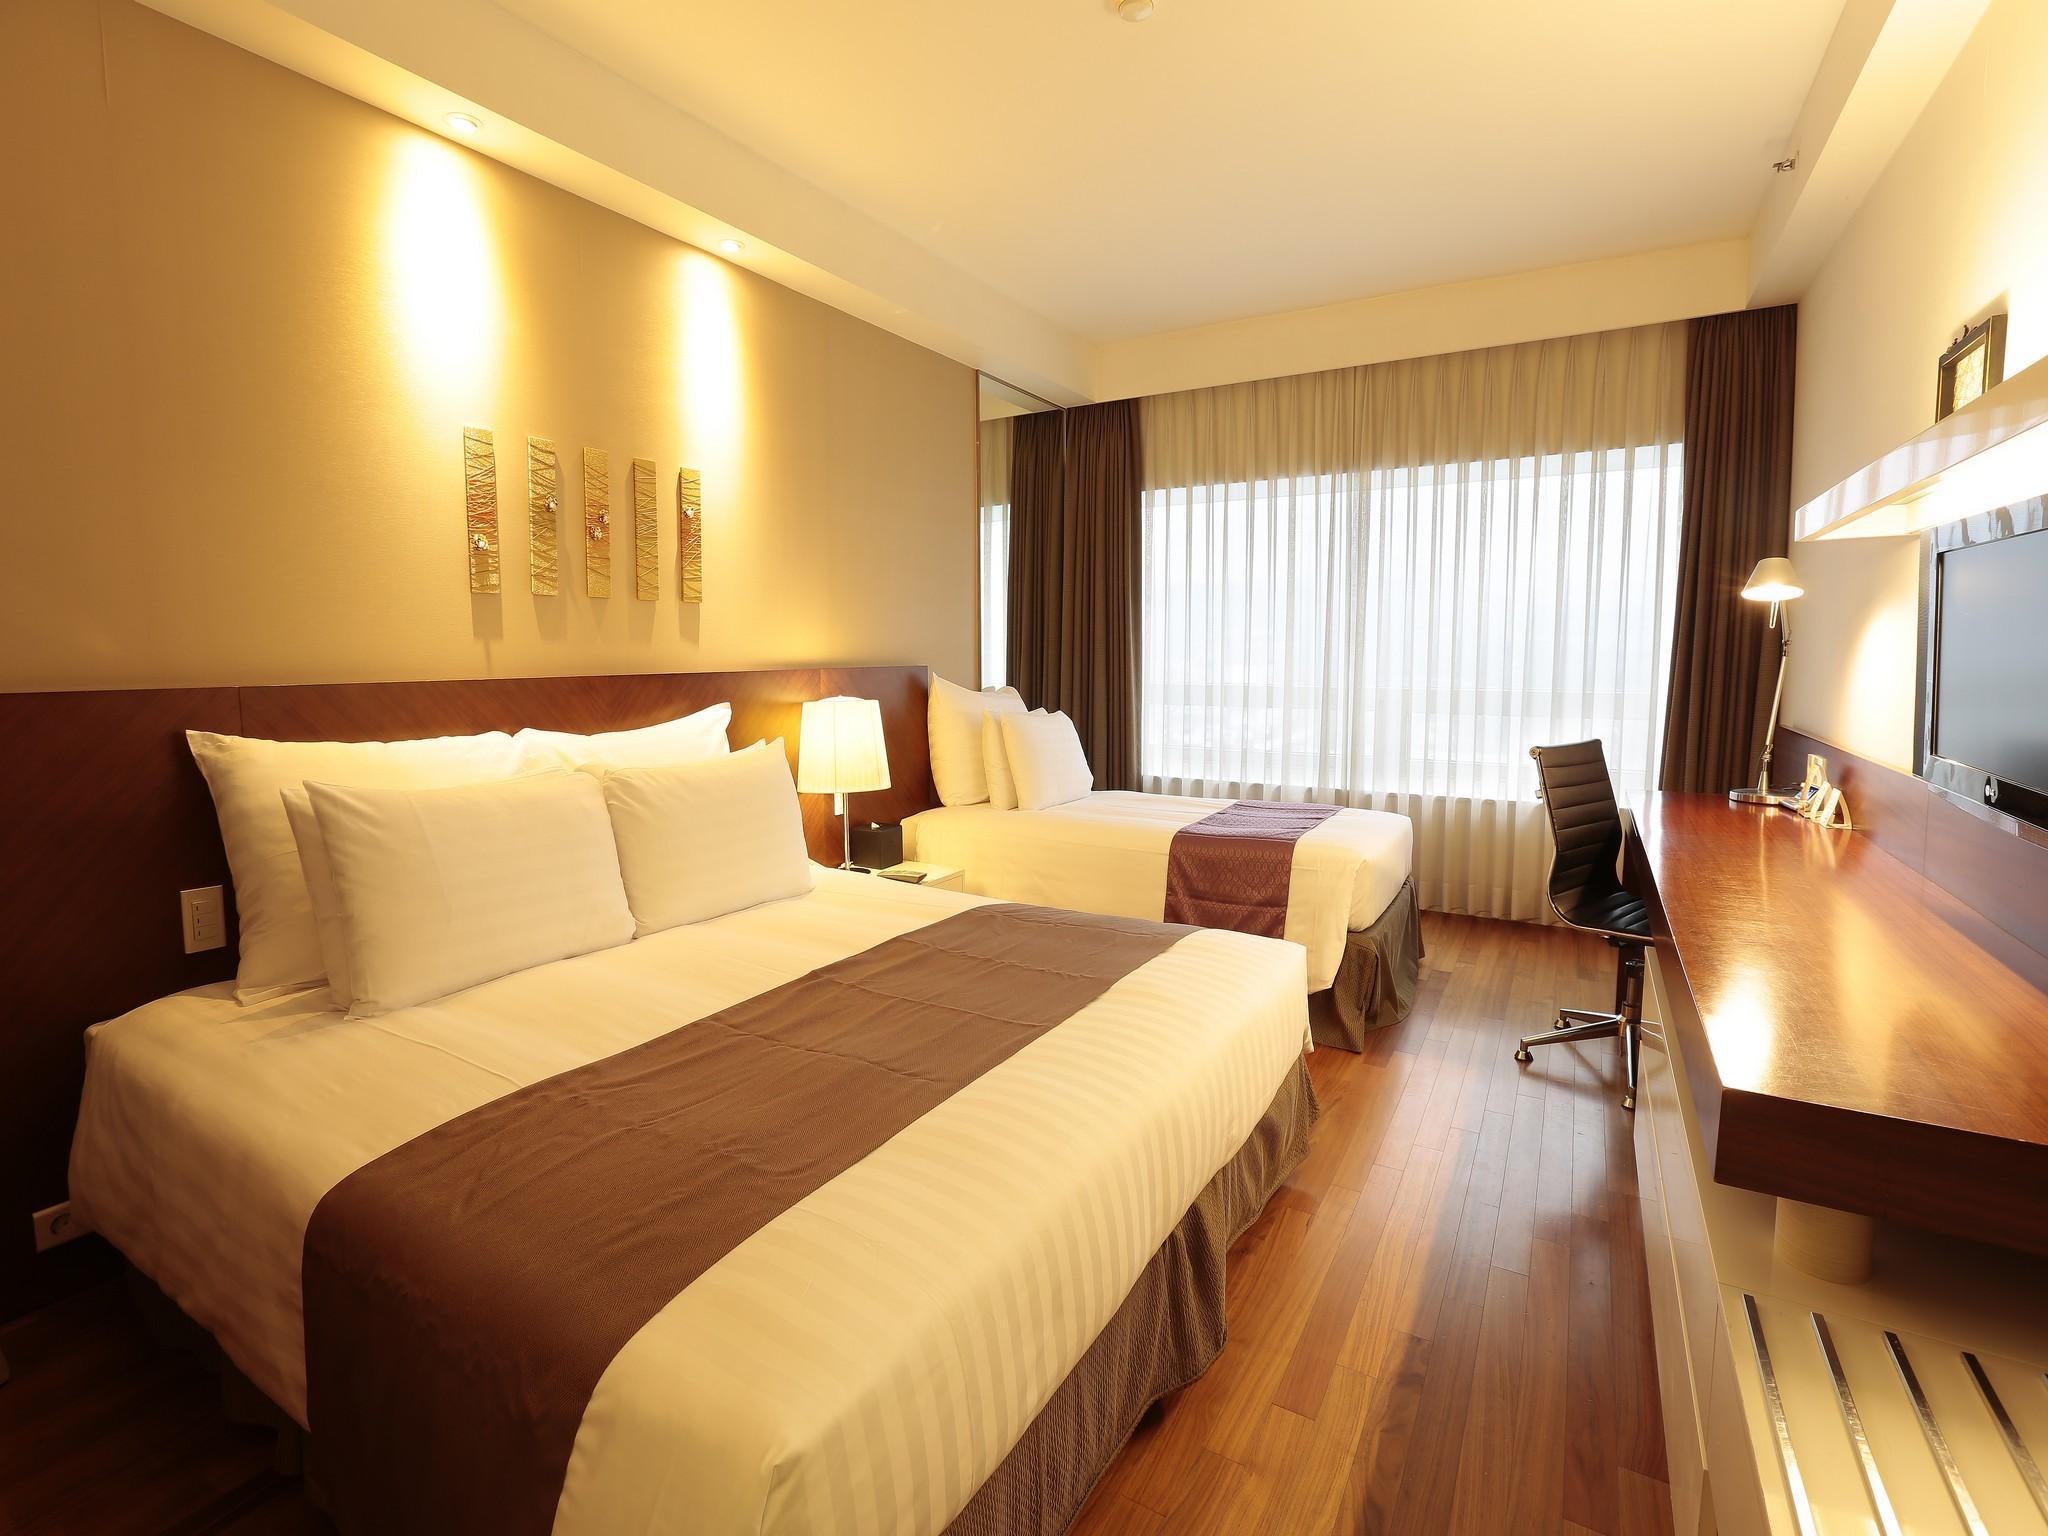 Book best western premier hotel kukdo seoul south korea hotels com - See Photos And Details